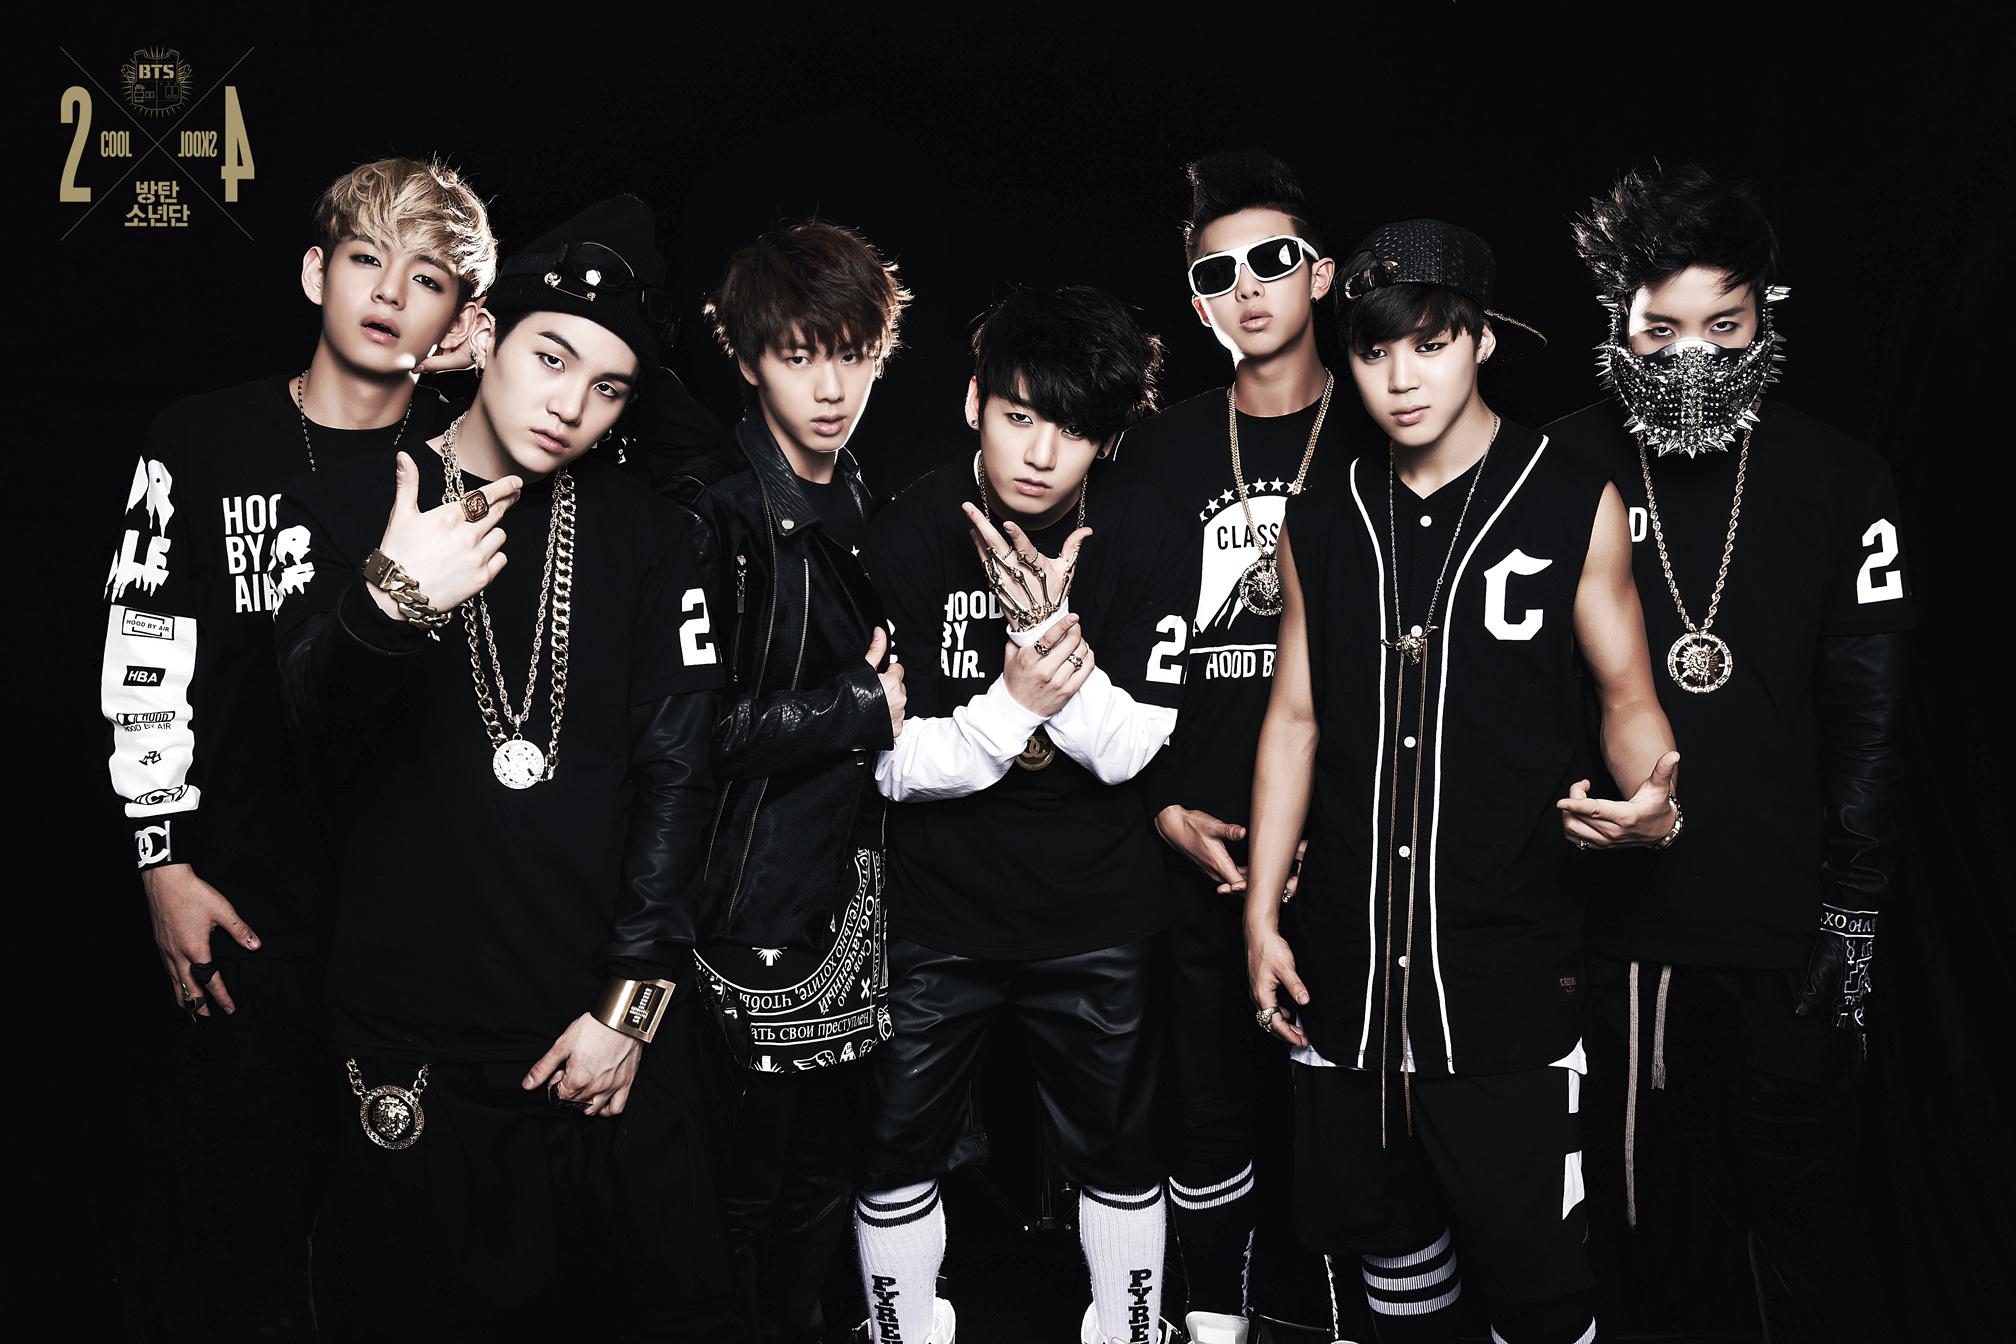 KPOP HD Wallpaper BTS Bangtan Boys Korean Boys Group KPOP HD Wallpaper 2016x1344